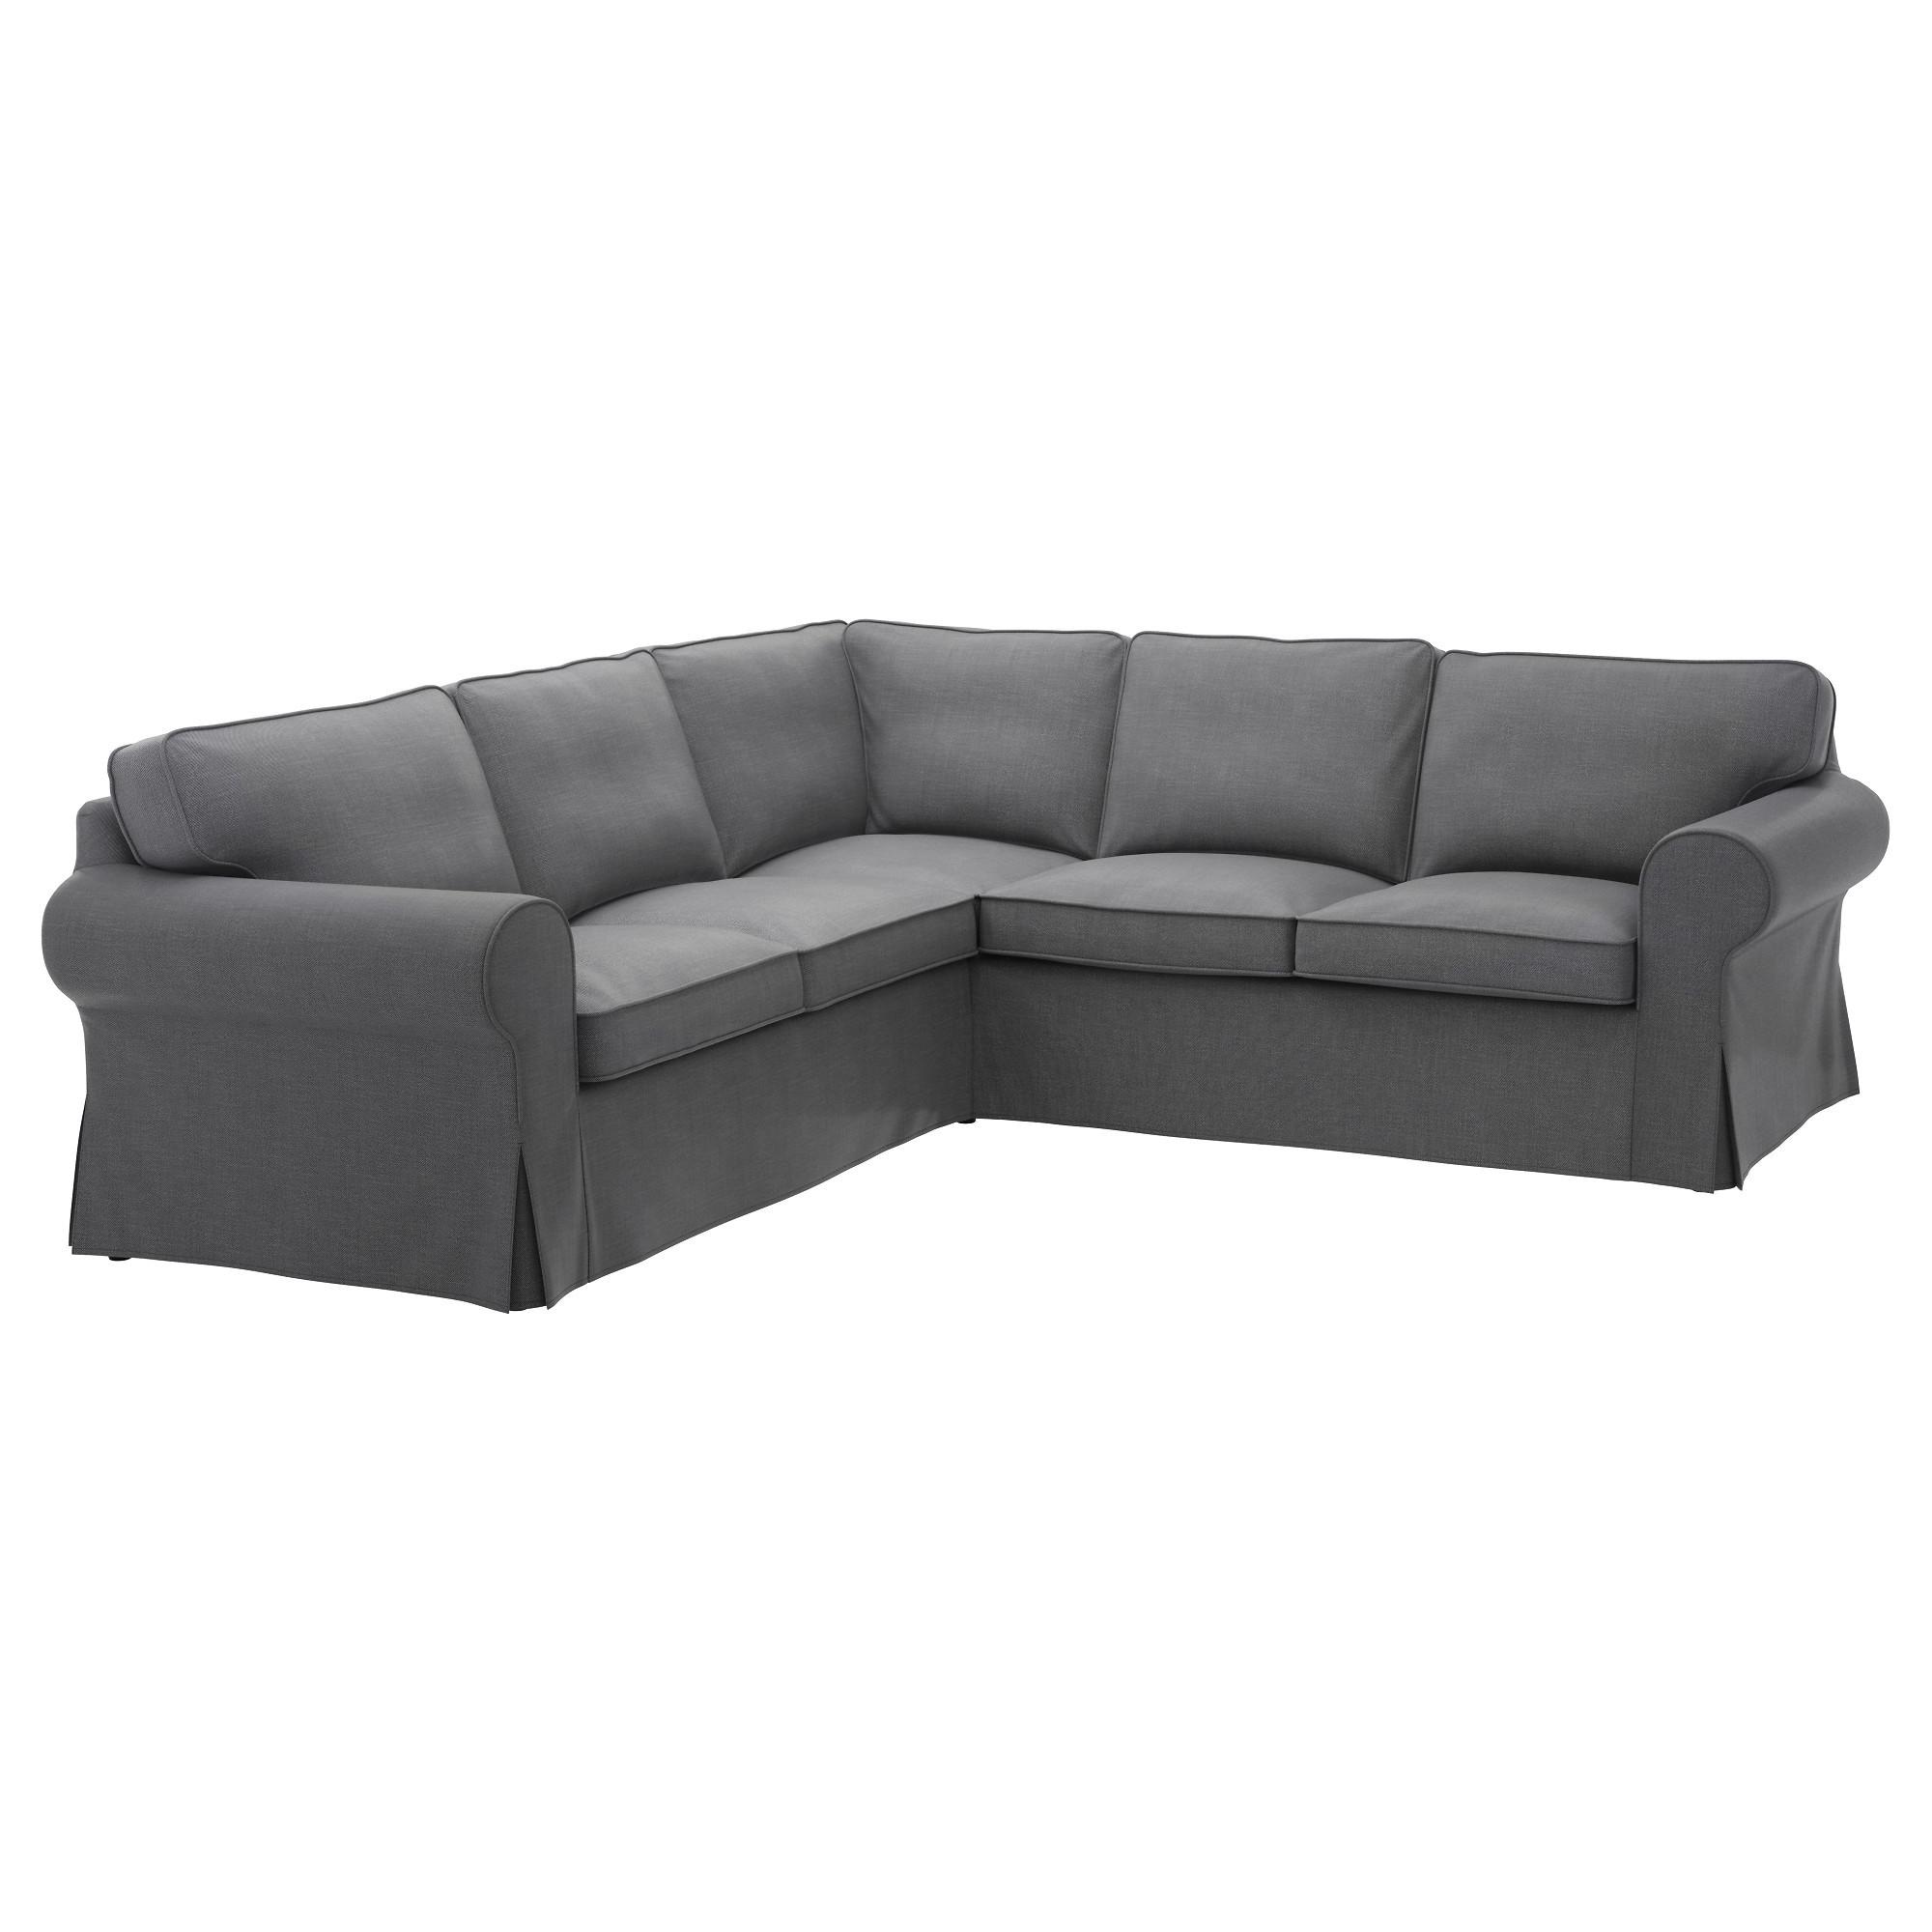 Best ideas about Ikea Sectional Sofa . Save or Pin EKTORP Corner sofa 4 seat Nordvalla dark grey IKEA Now.